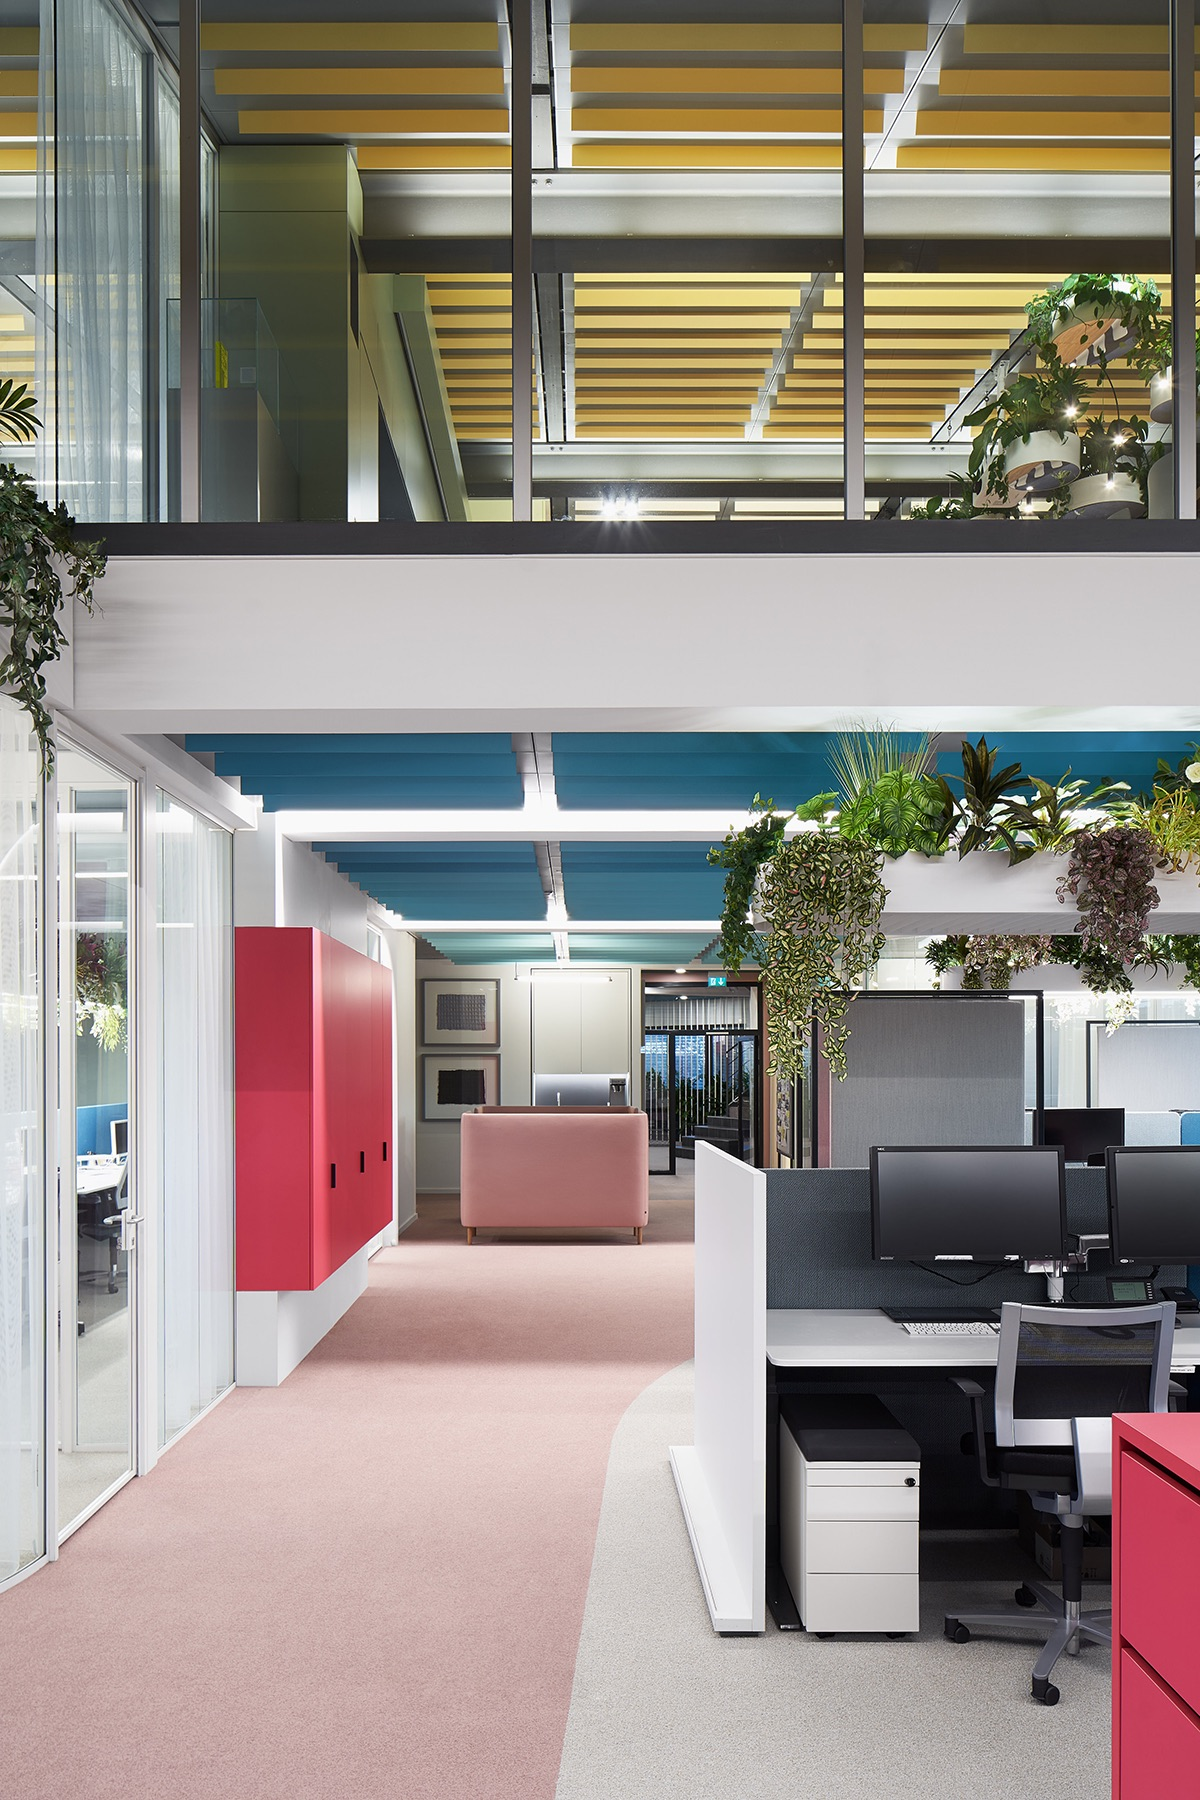 roman-klis-design-office-3